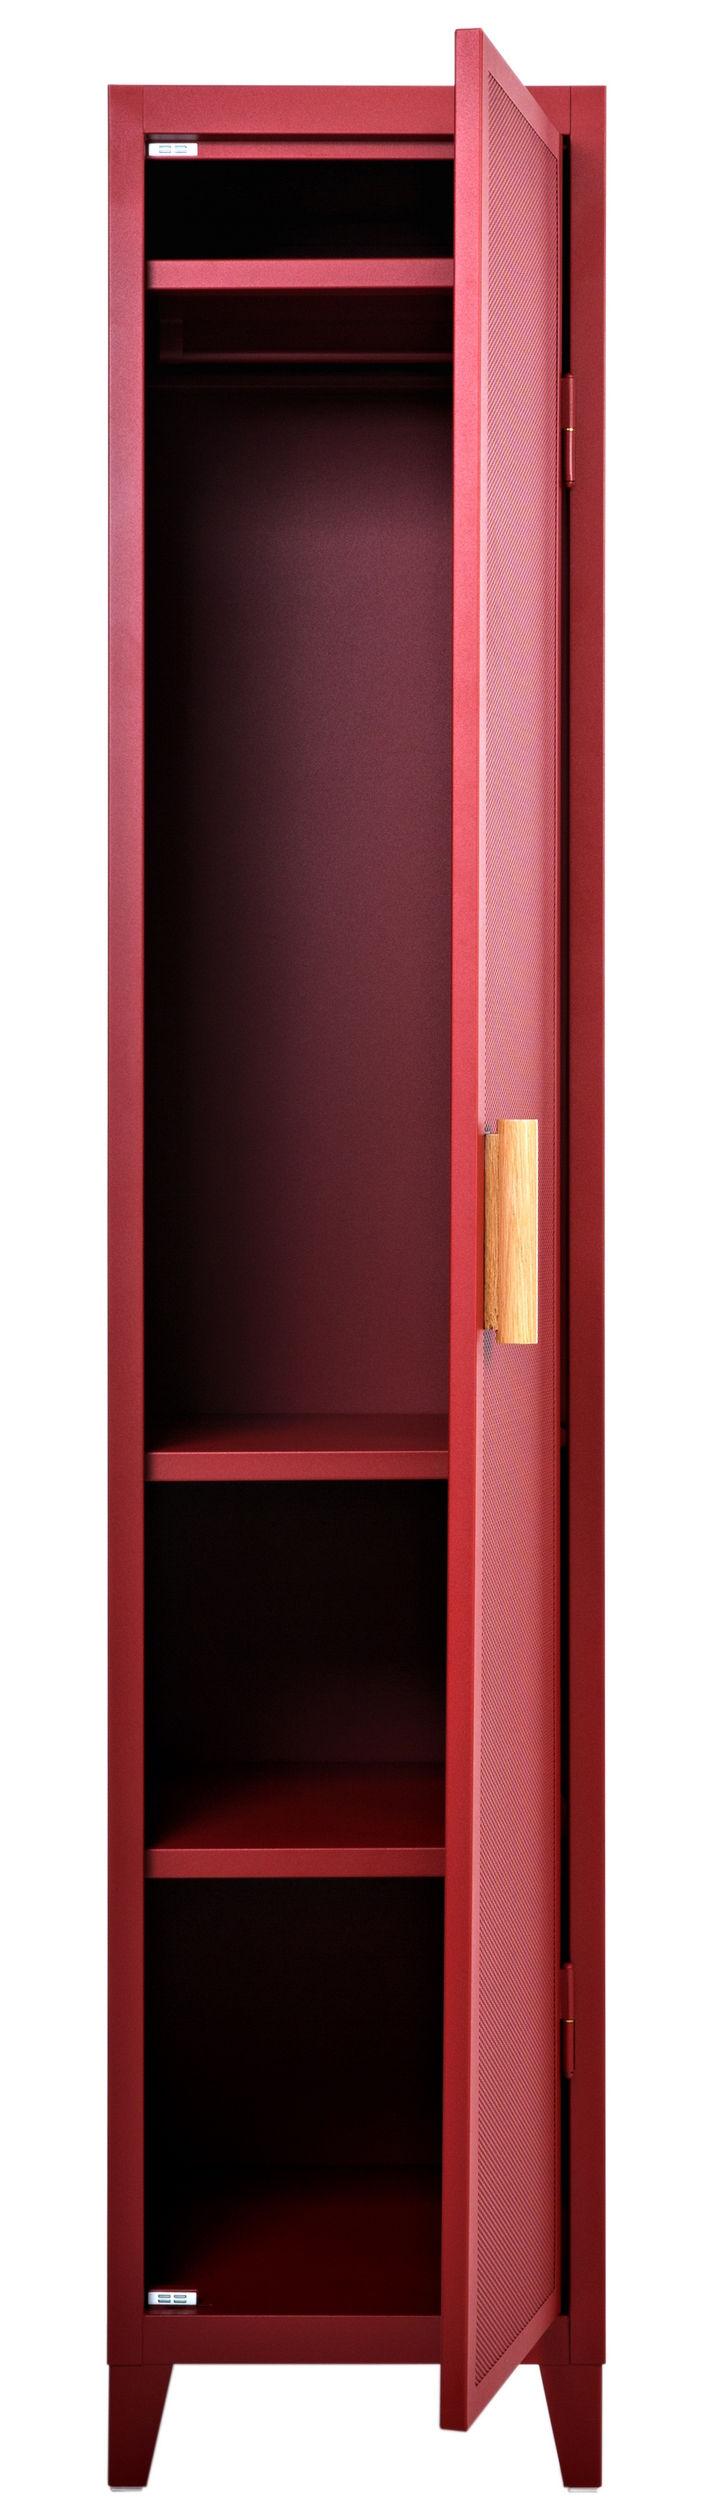 rangement vestiaire penderie 1 porte acier perfor. Black Bedroom Furniture Sets. Home Design Ideas